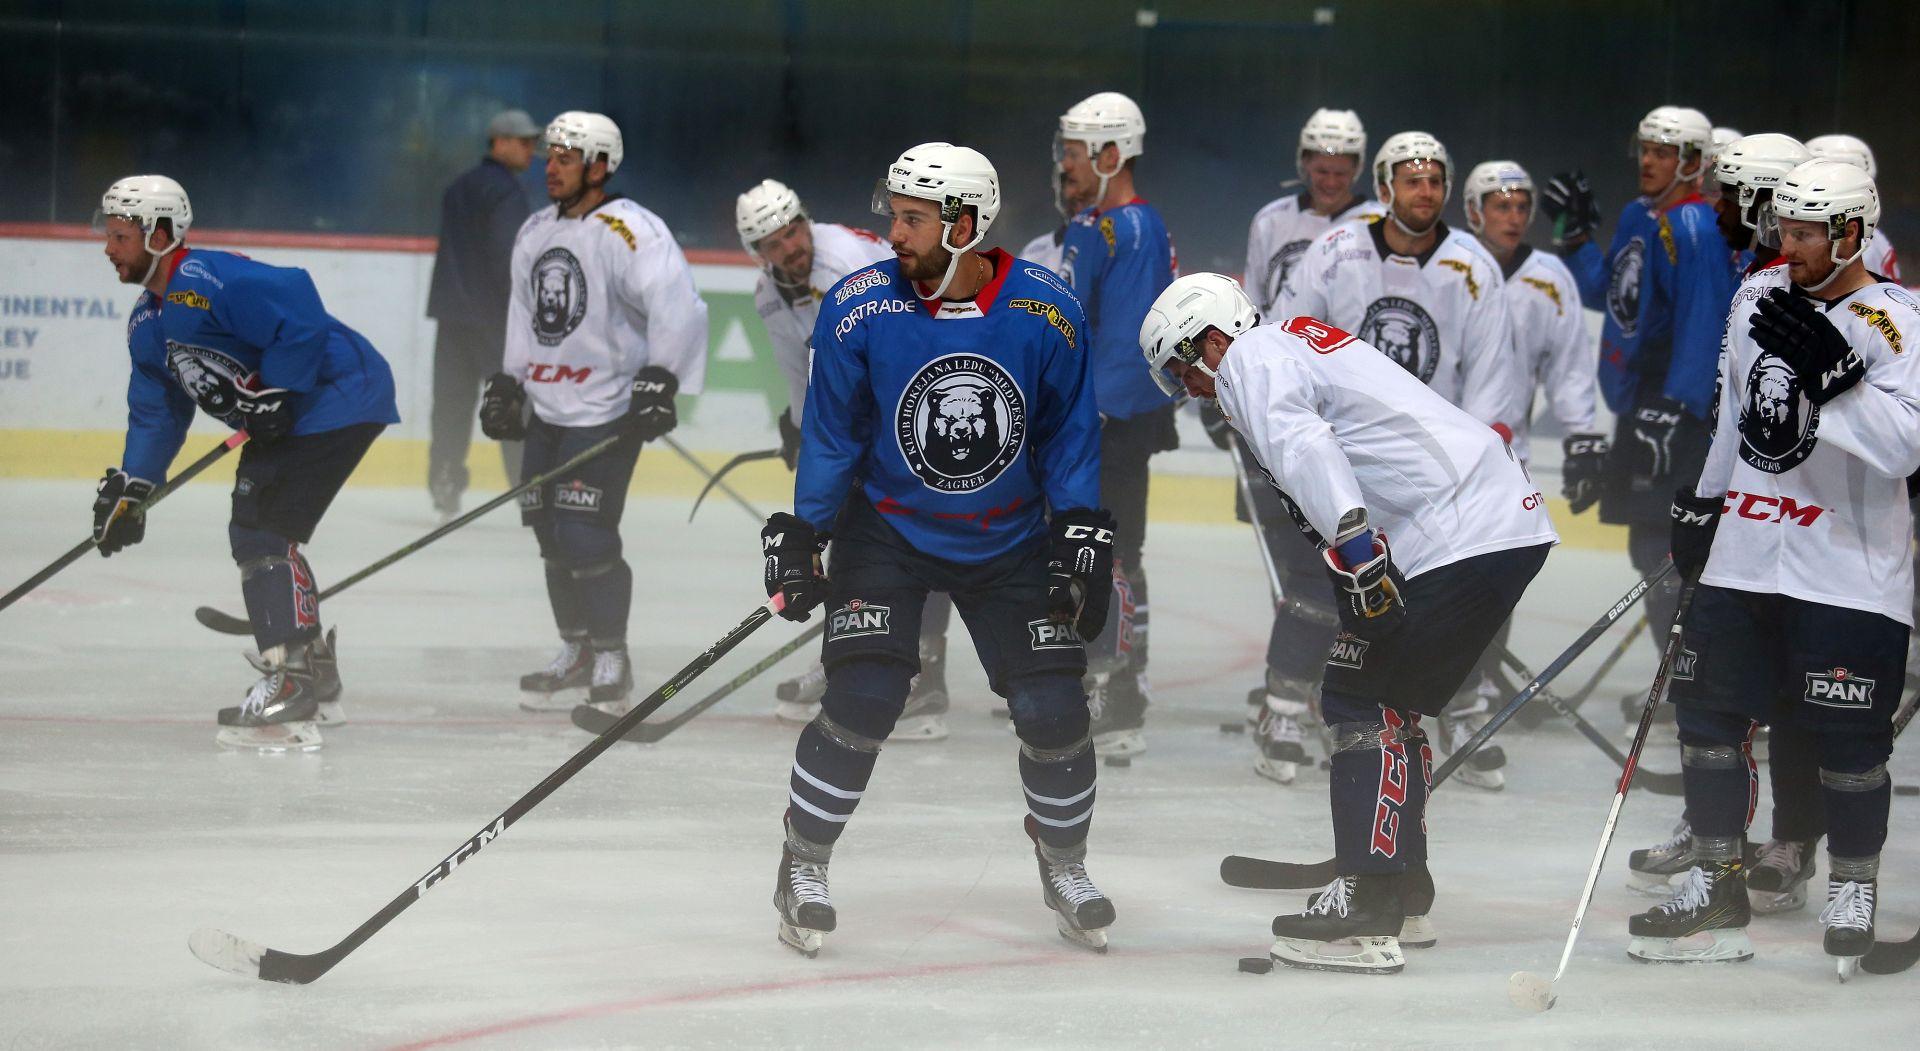 Prvi trening Medveščaka pred svojim navijačima u Ledenoj dvorani